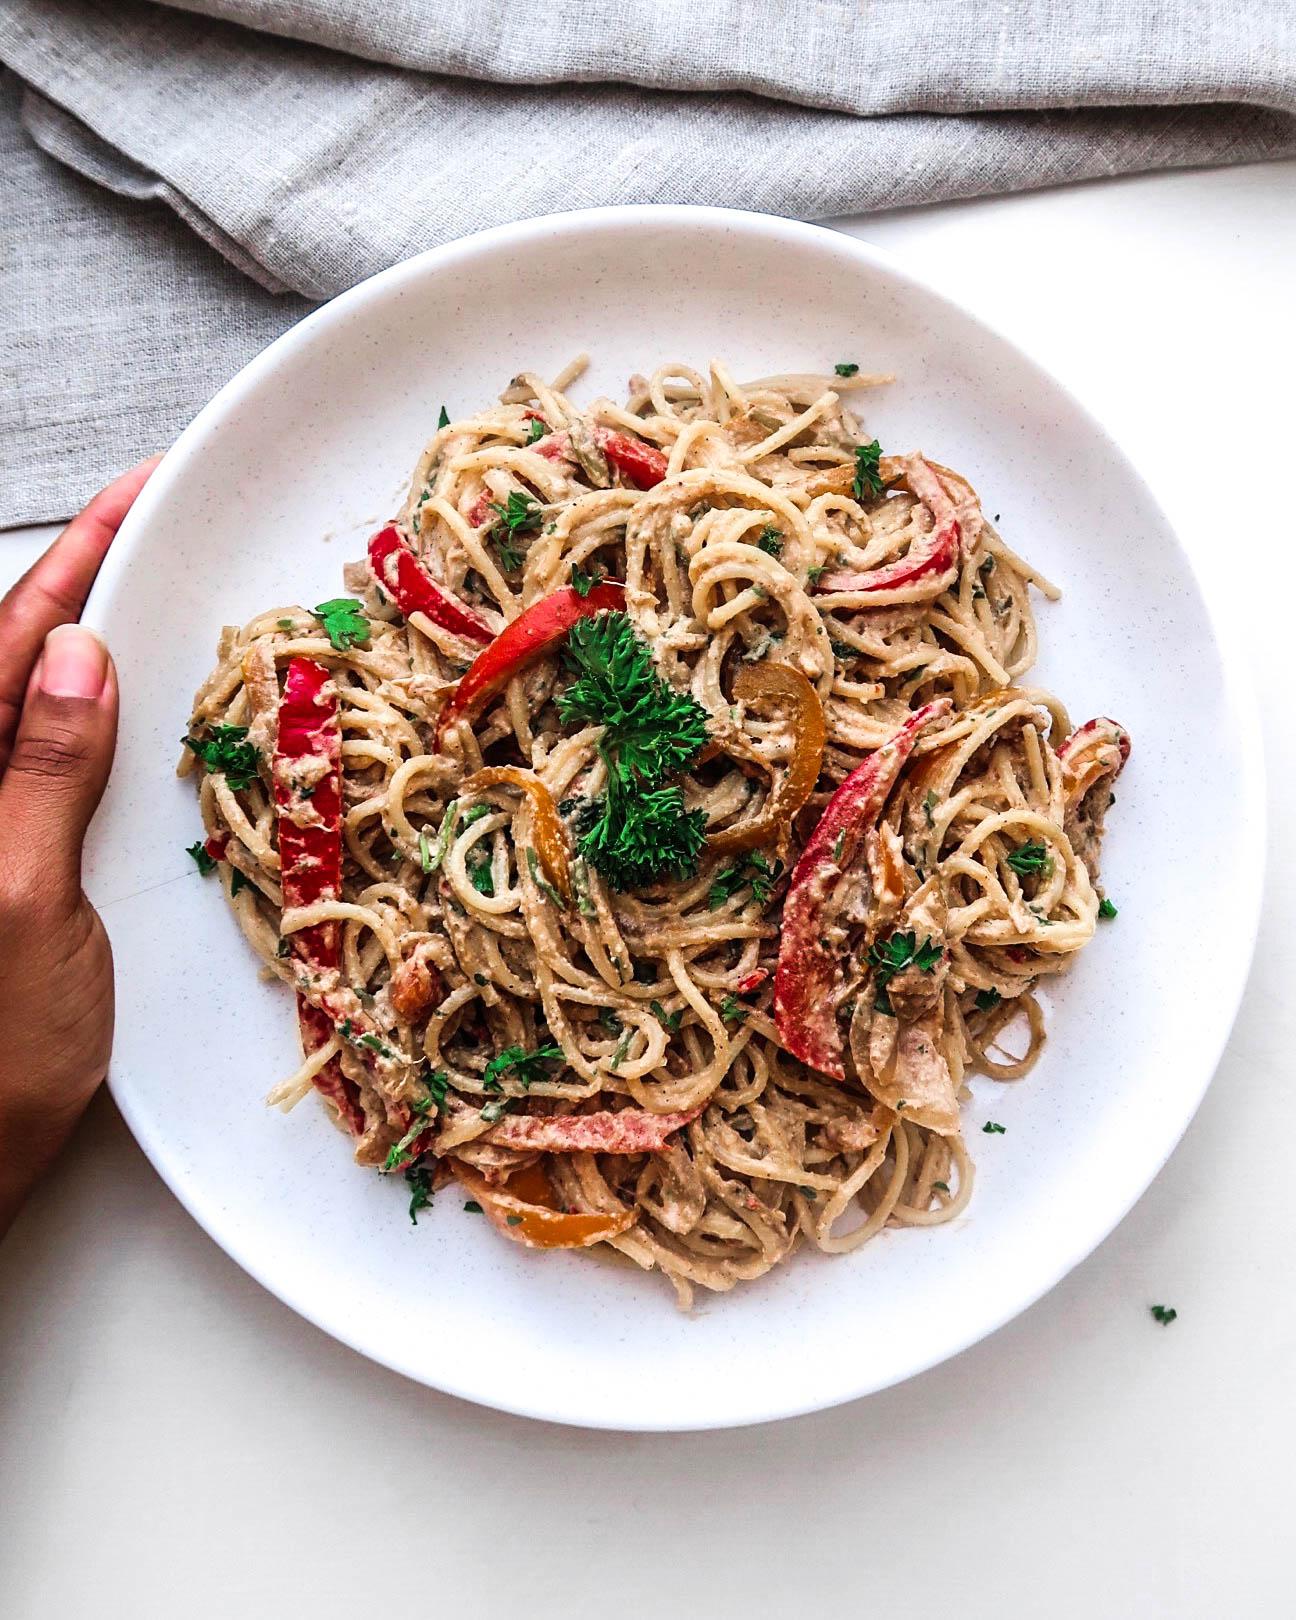 Rasta Pasta! - flavourful creamy and spicy pasta